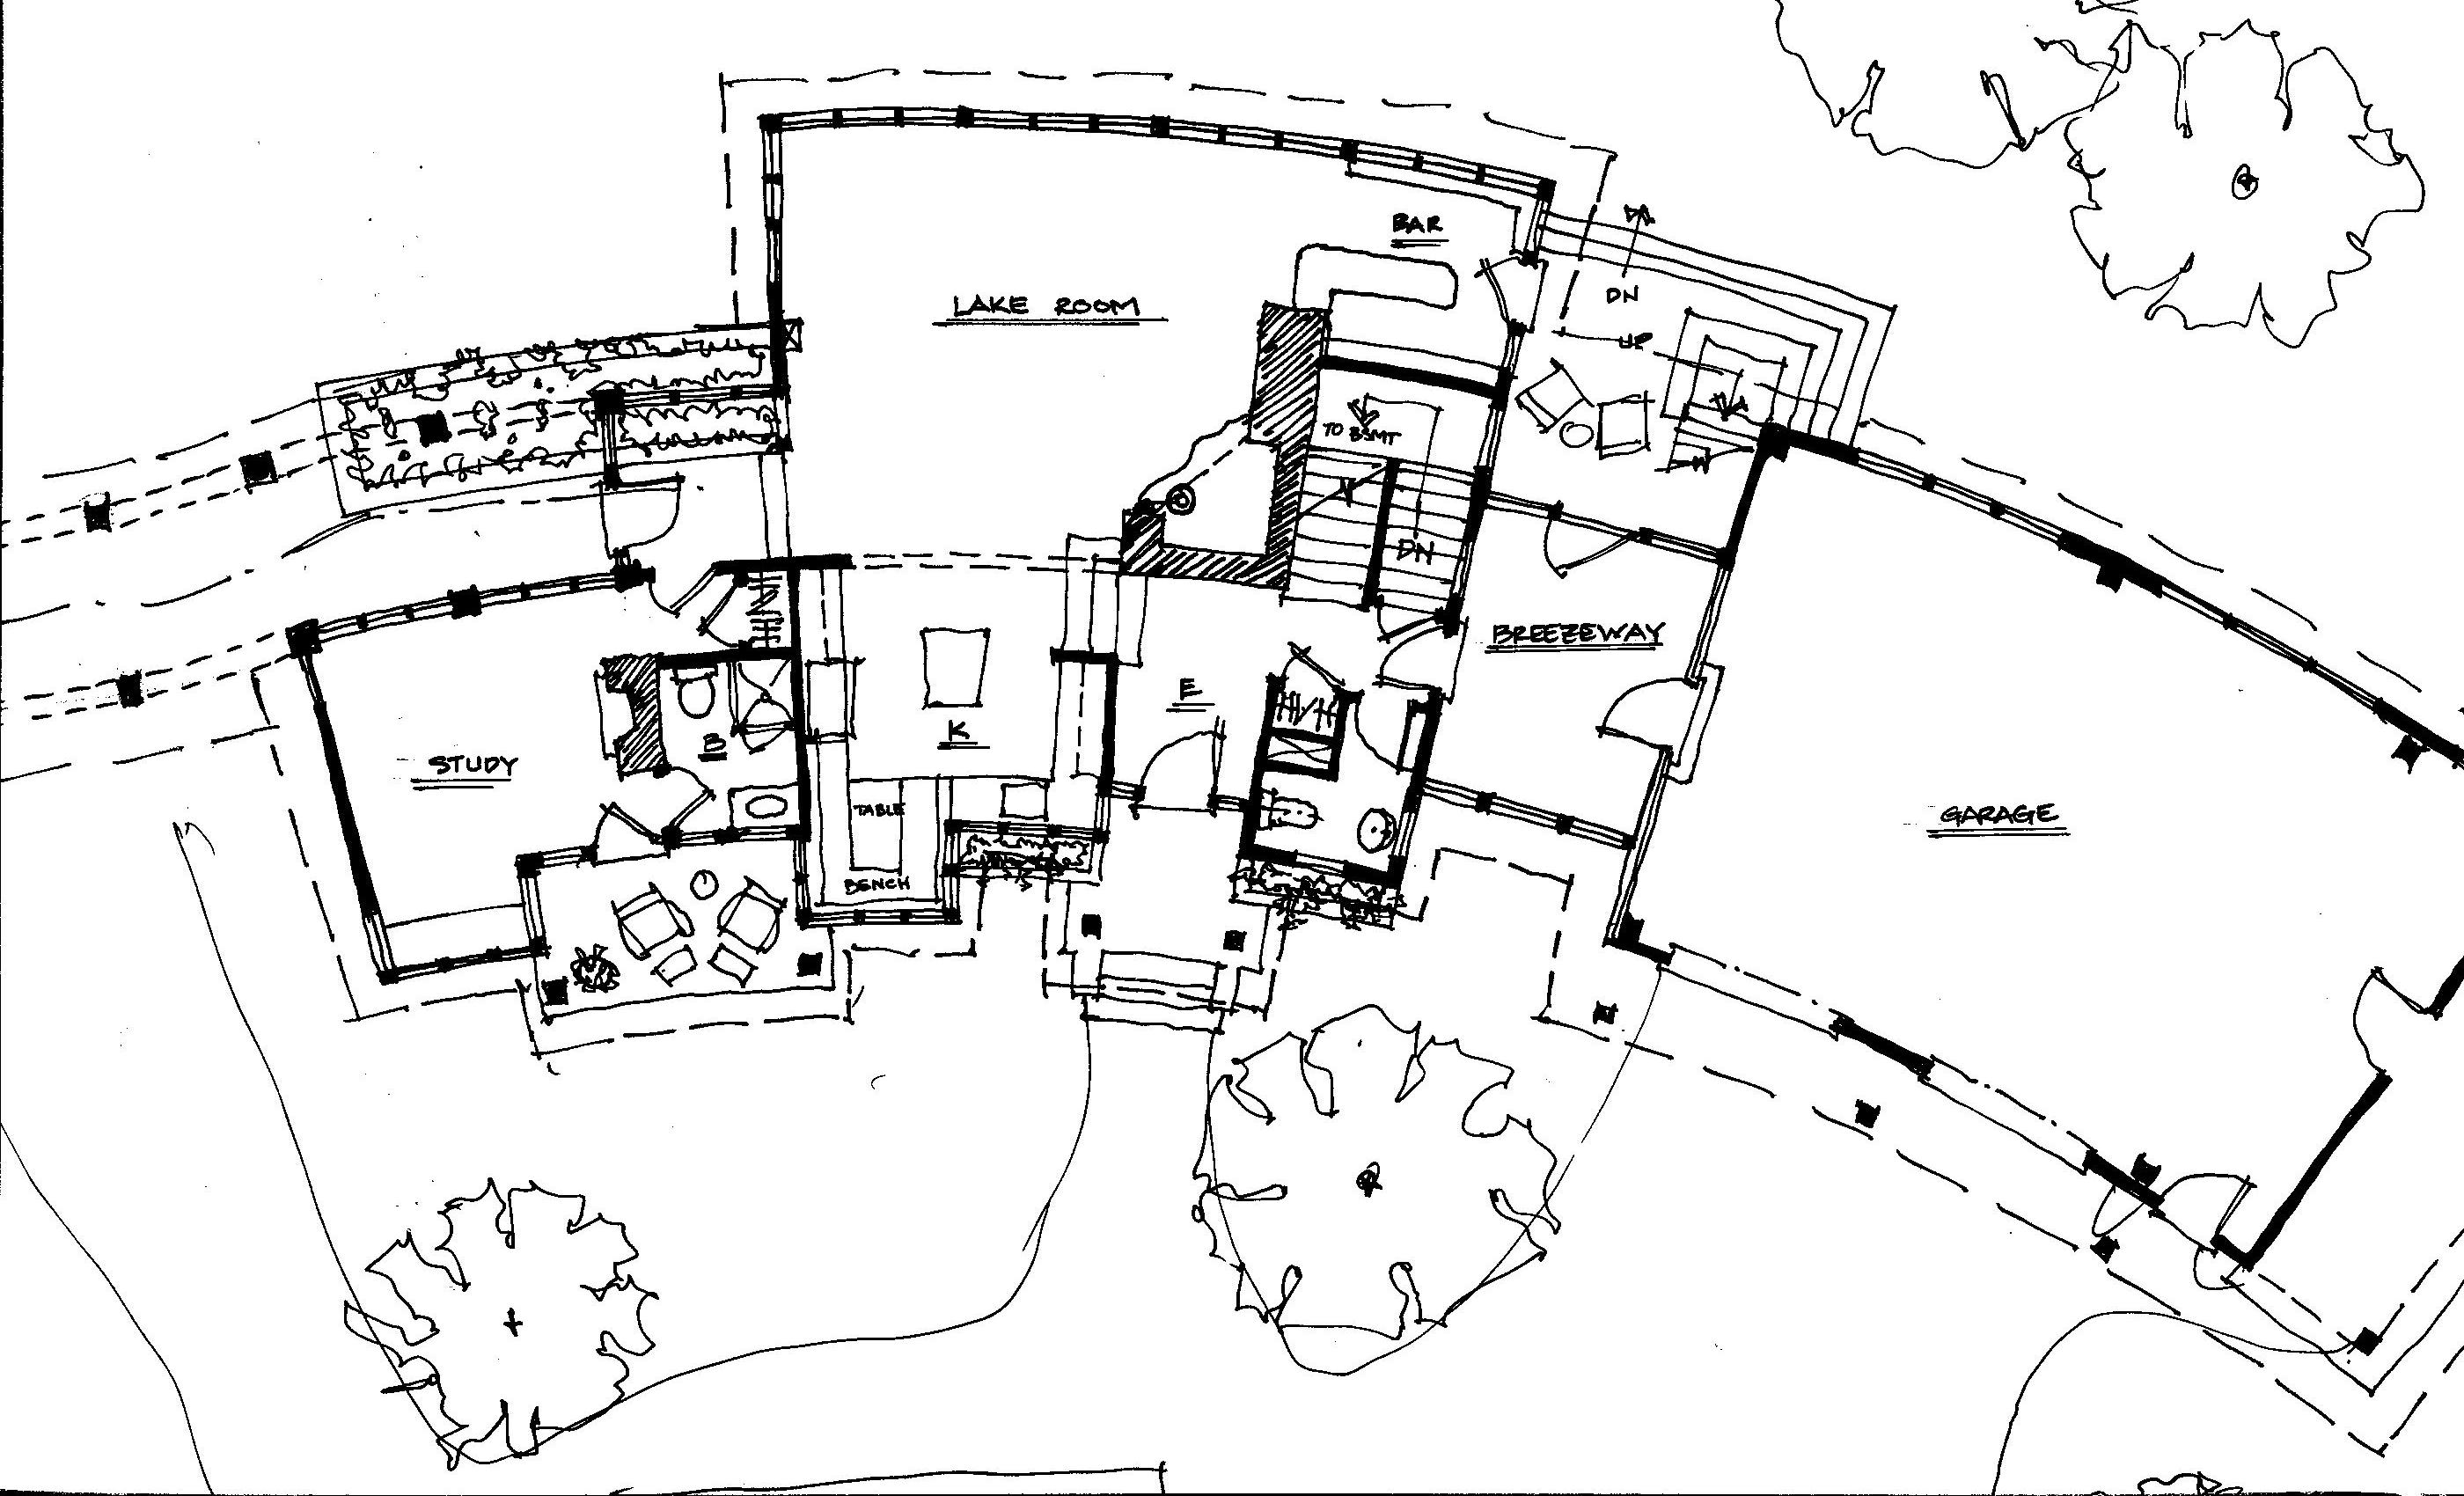 Lake house floor plans lake house floor plans lcxzzcom for Lake house blueprints